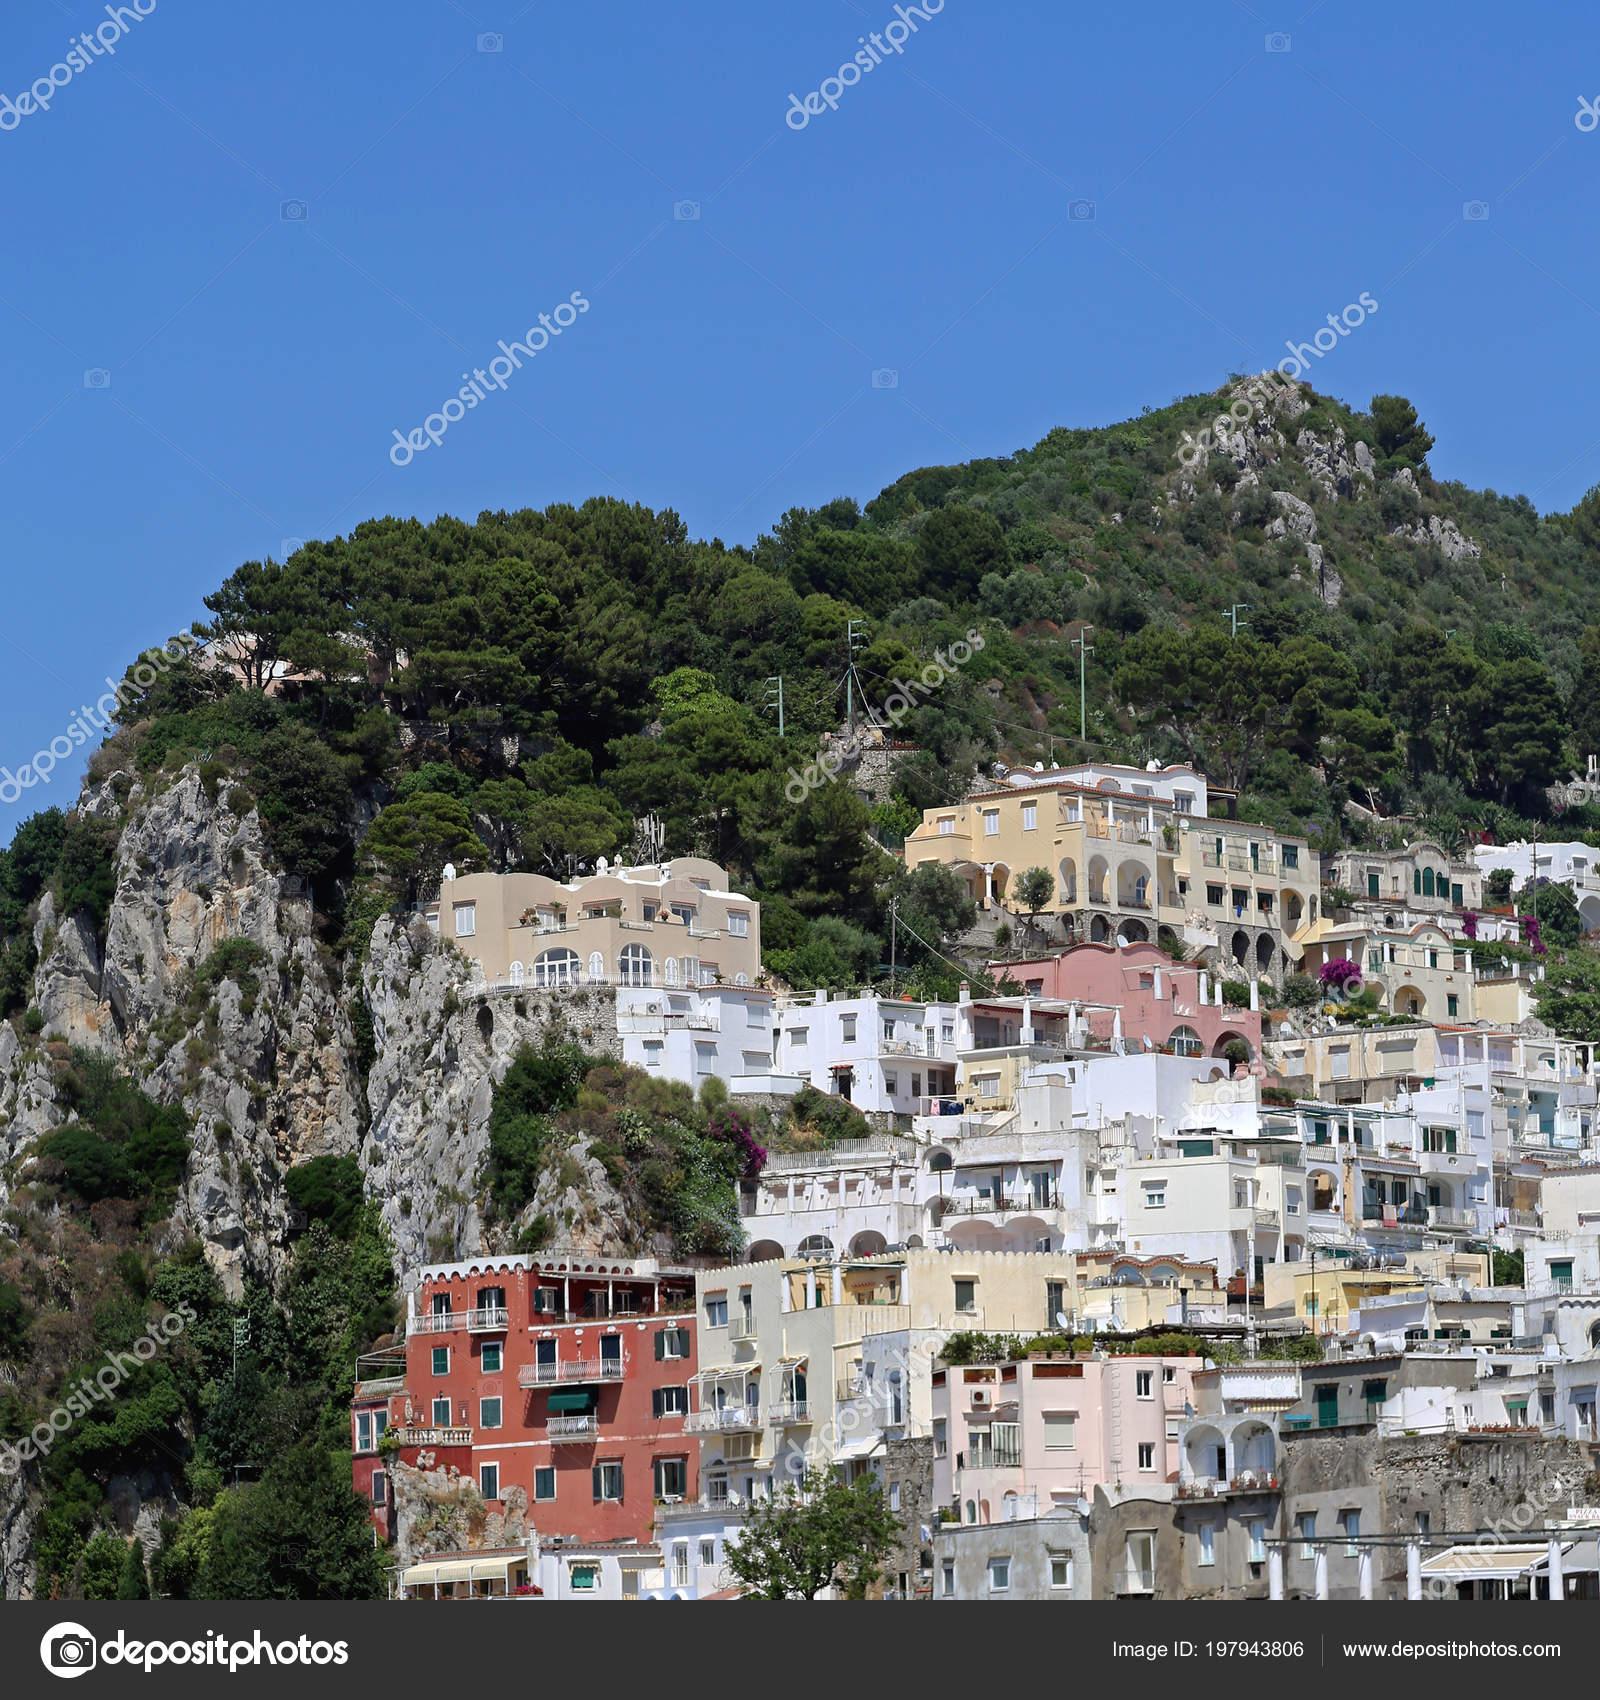 . Houses Cliffs Capri Island Italy   Stock Photo   Baloncici  197943806